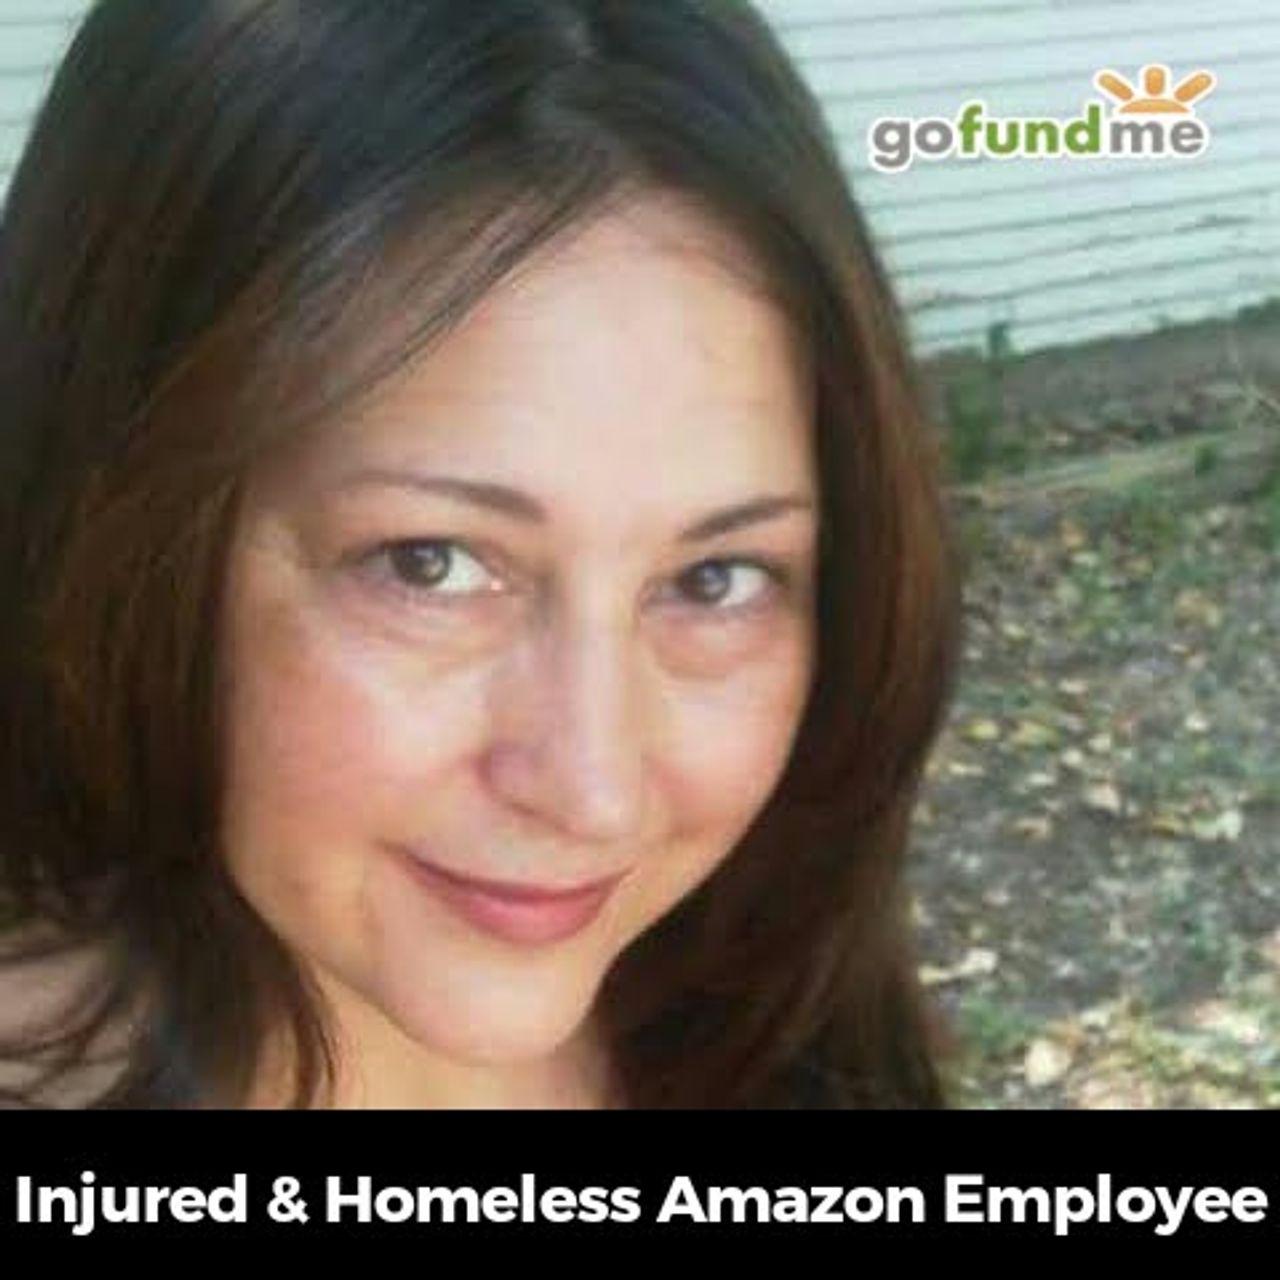 Injured homeless Amazon worker Tammy Edgar